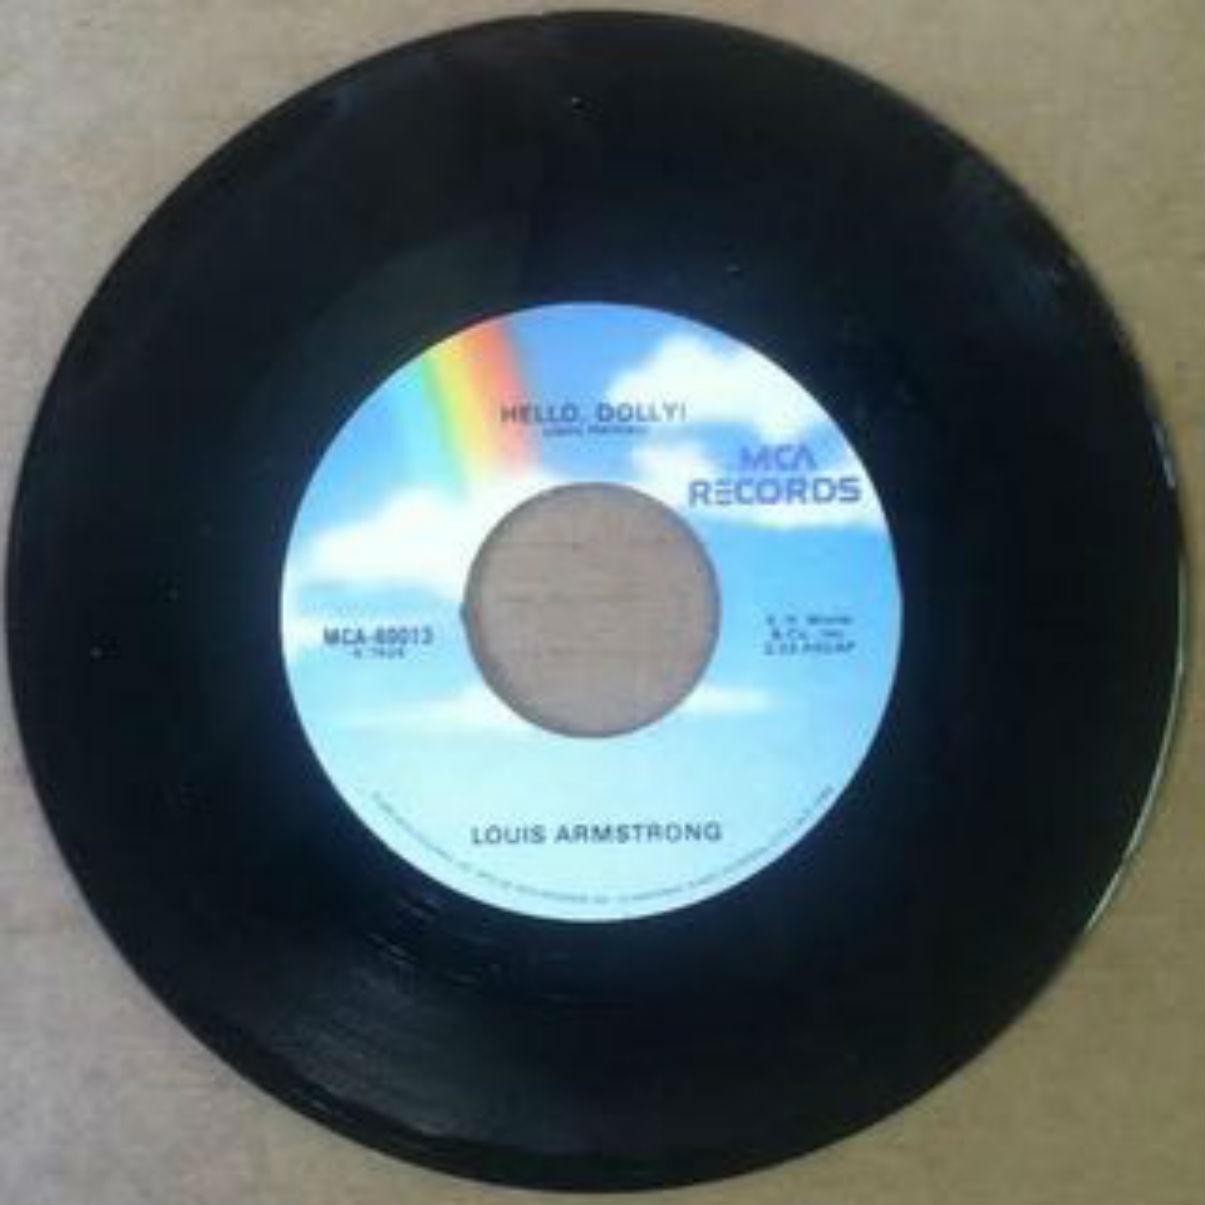 Louis Armstrong - Hello, Dolly Record